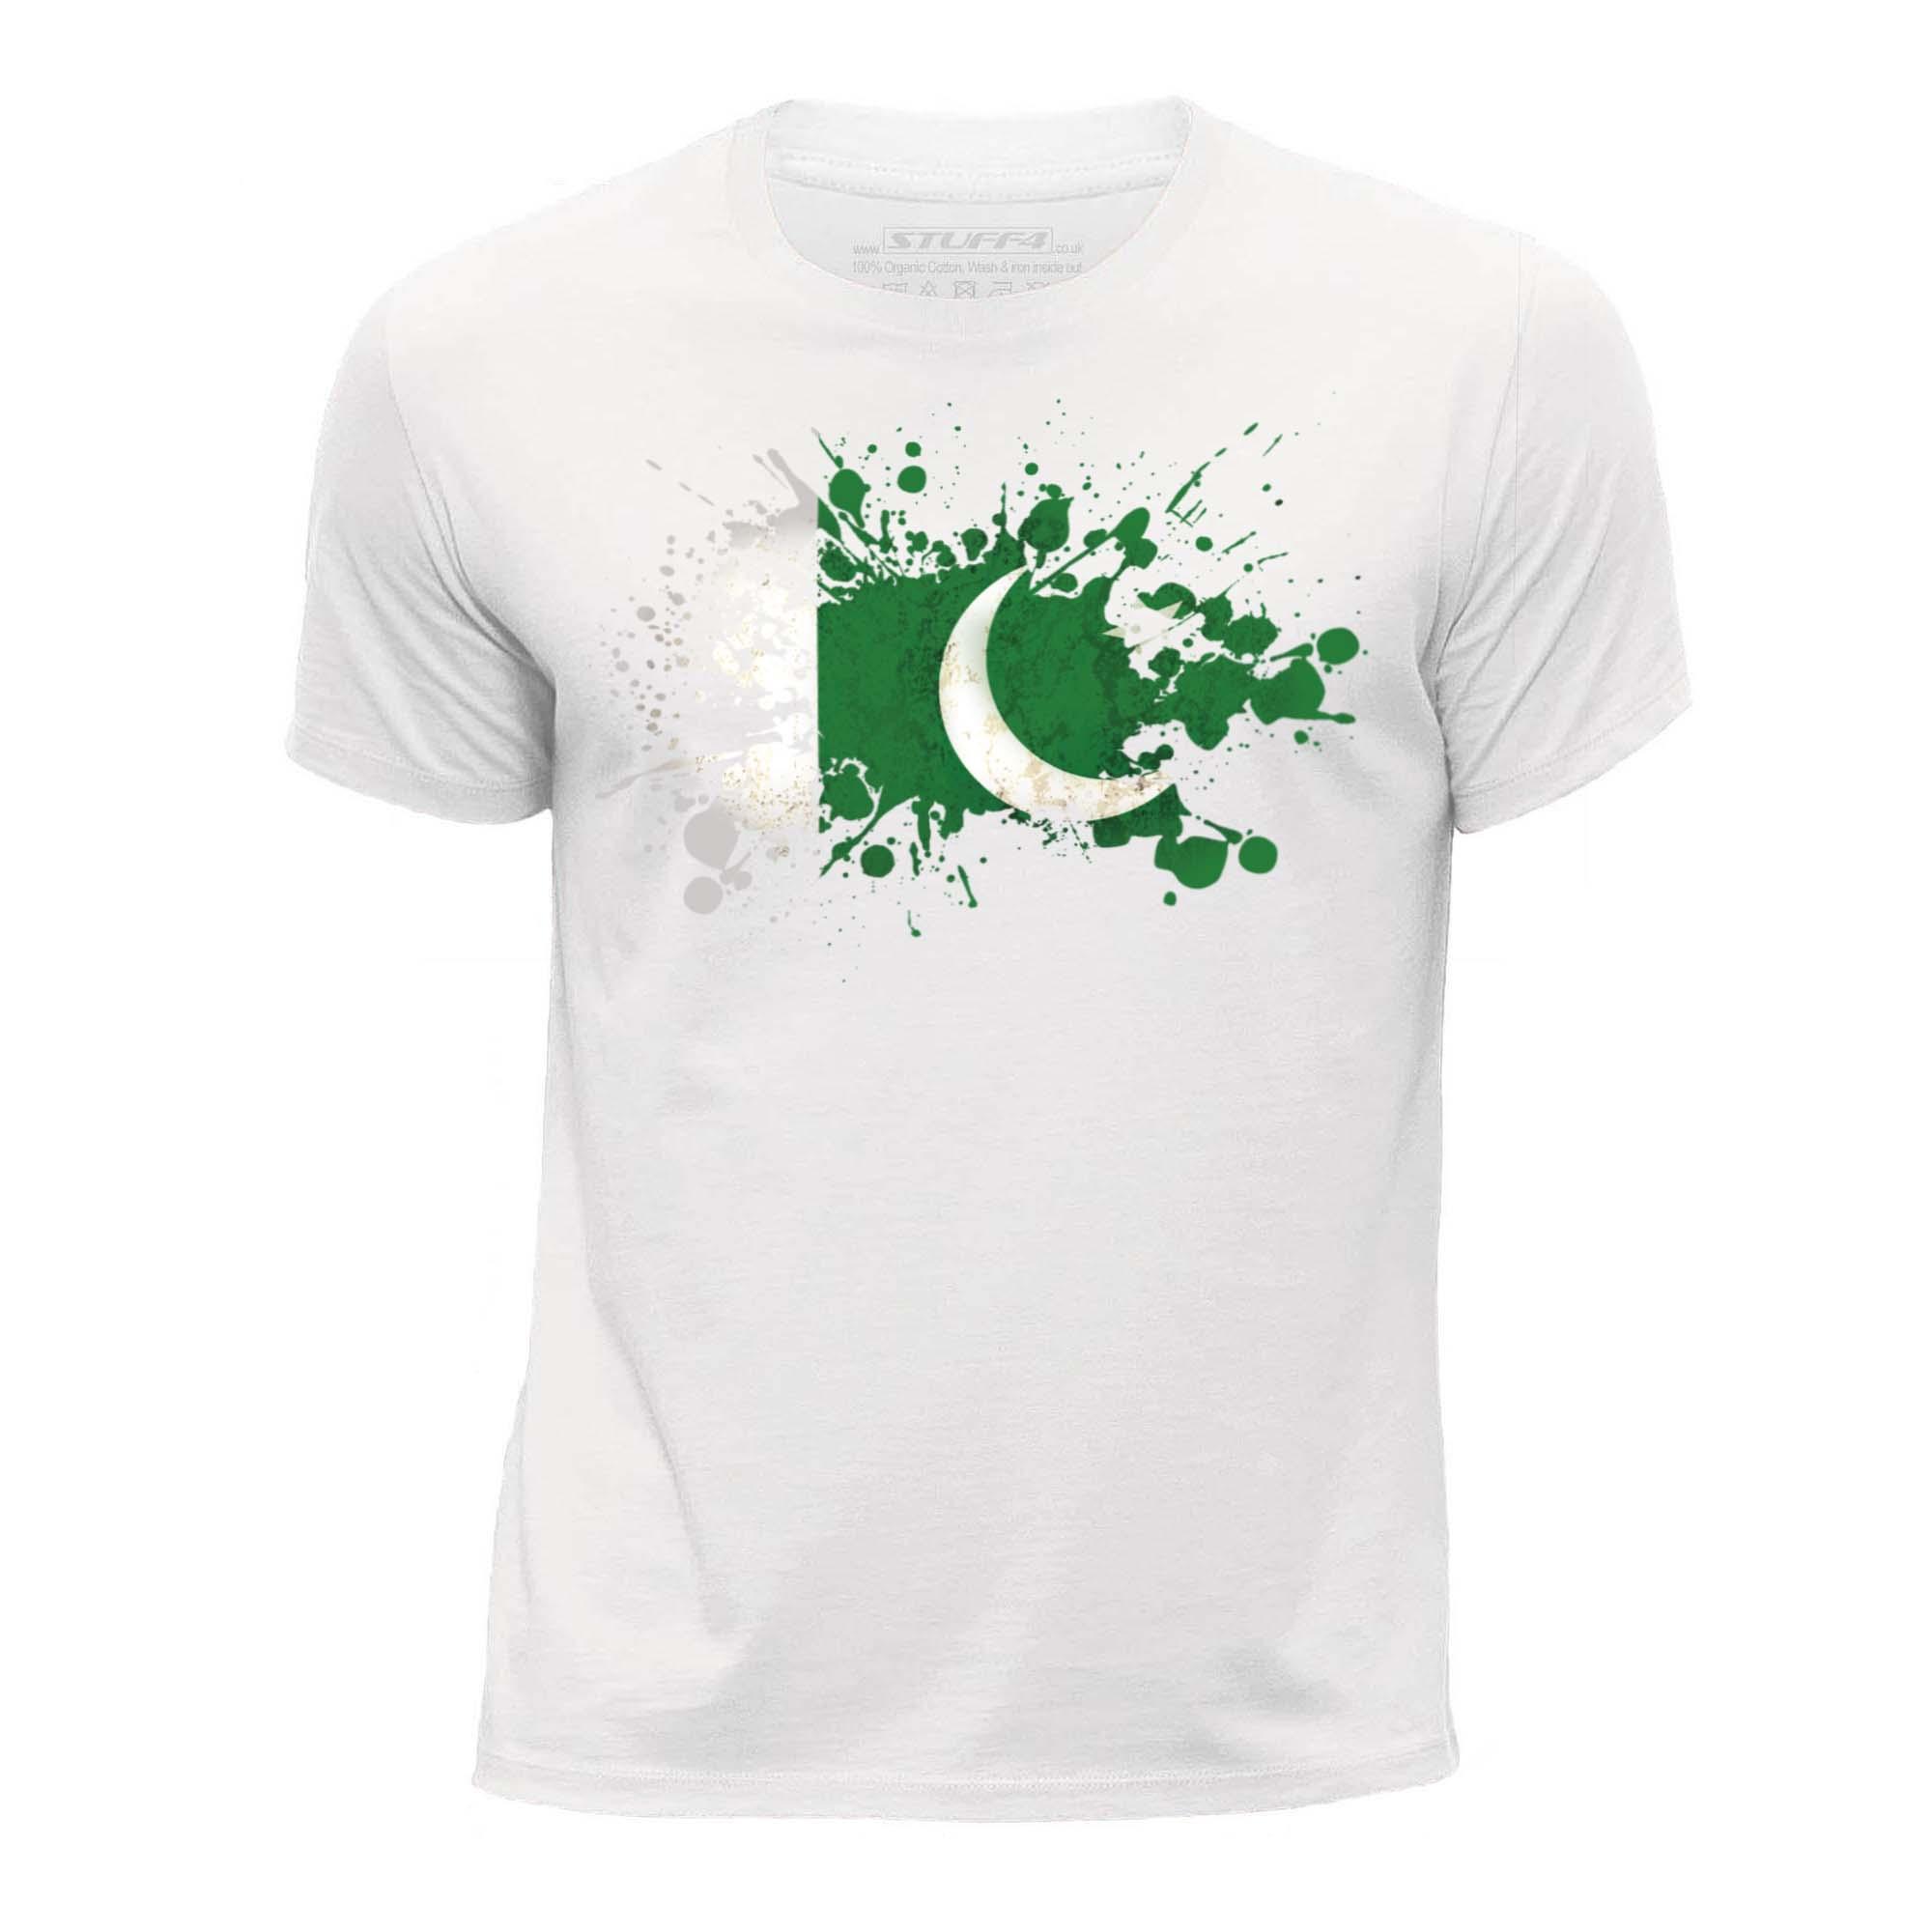 Design T Shirts Online Pakistan Rldm